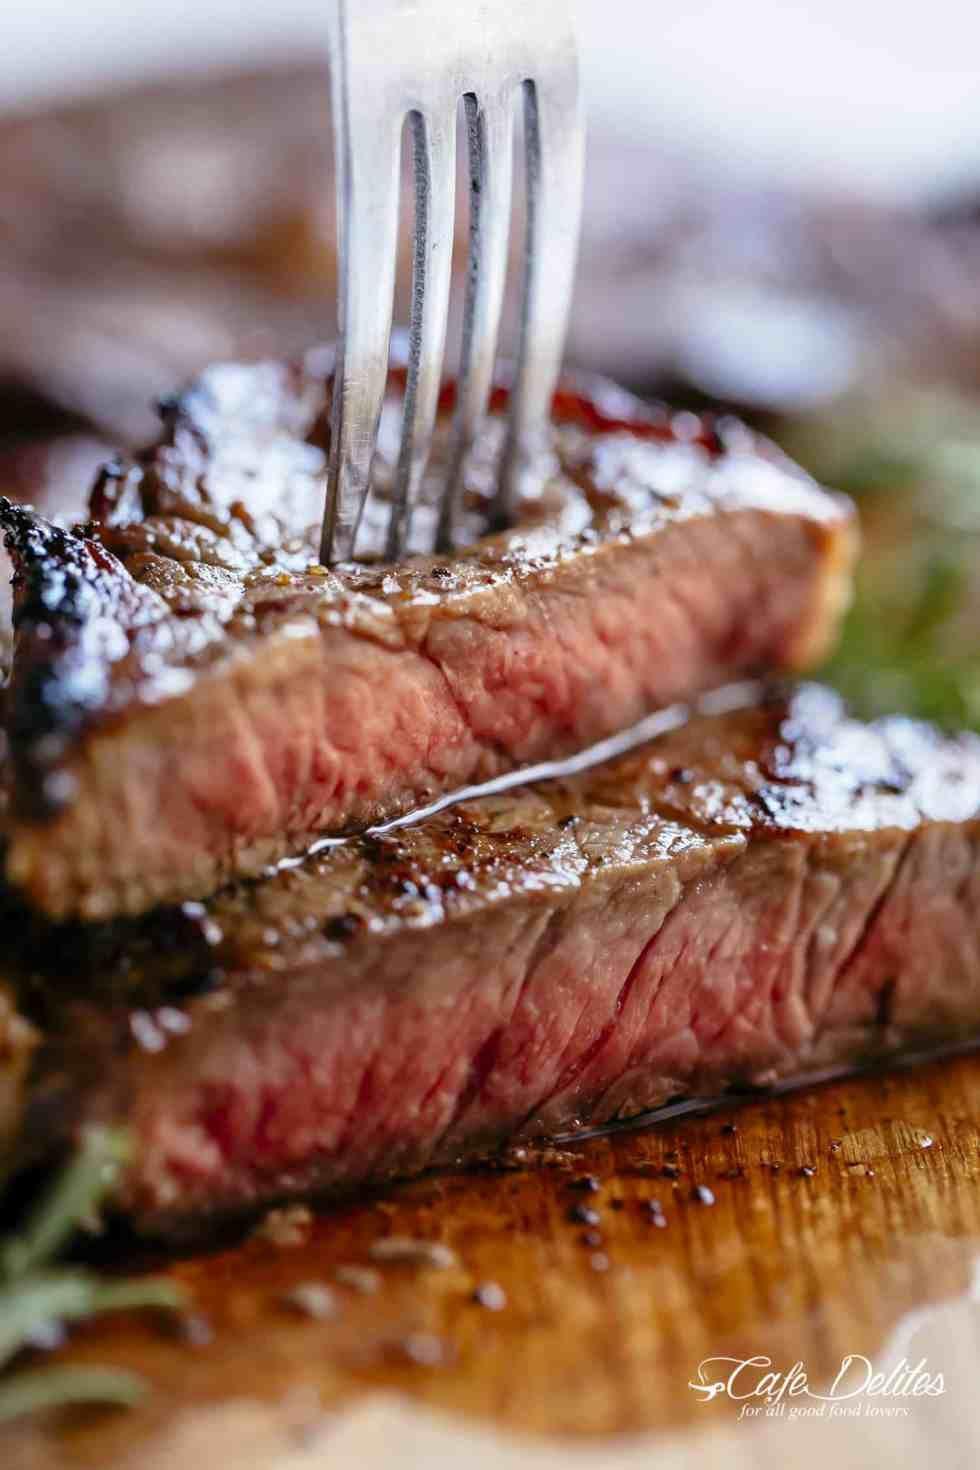 Steakhouse Steak Cafe Delites Rare Steak Medium Rare